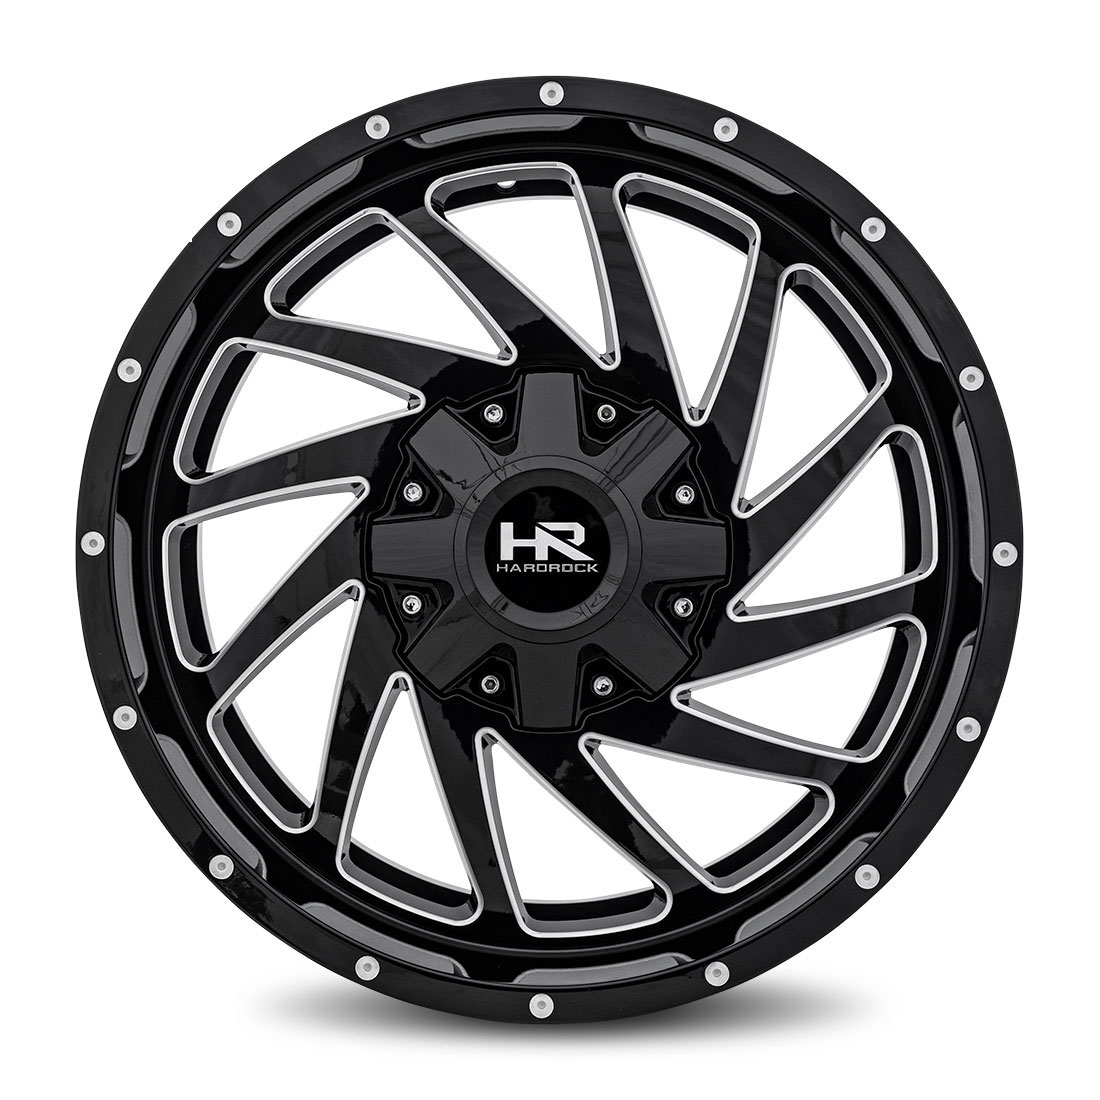 Hardrock Offroad Wheels H704 Crusher - Gloss Black Milled - 20x9